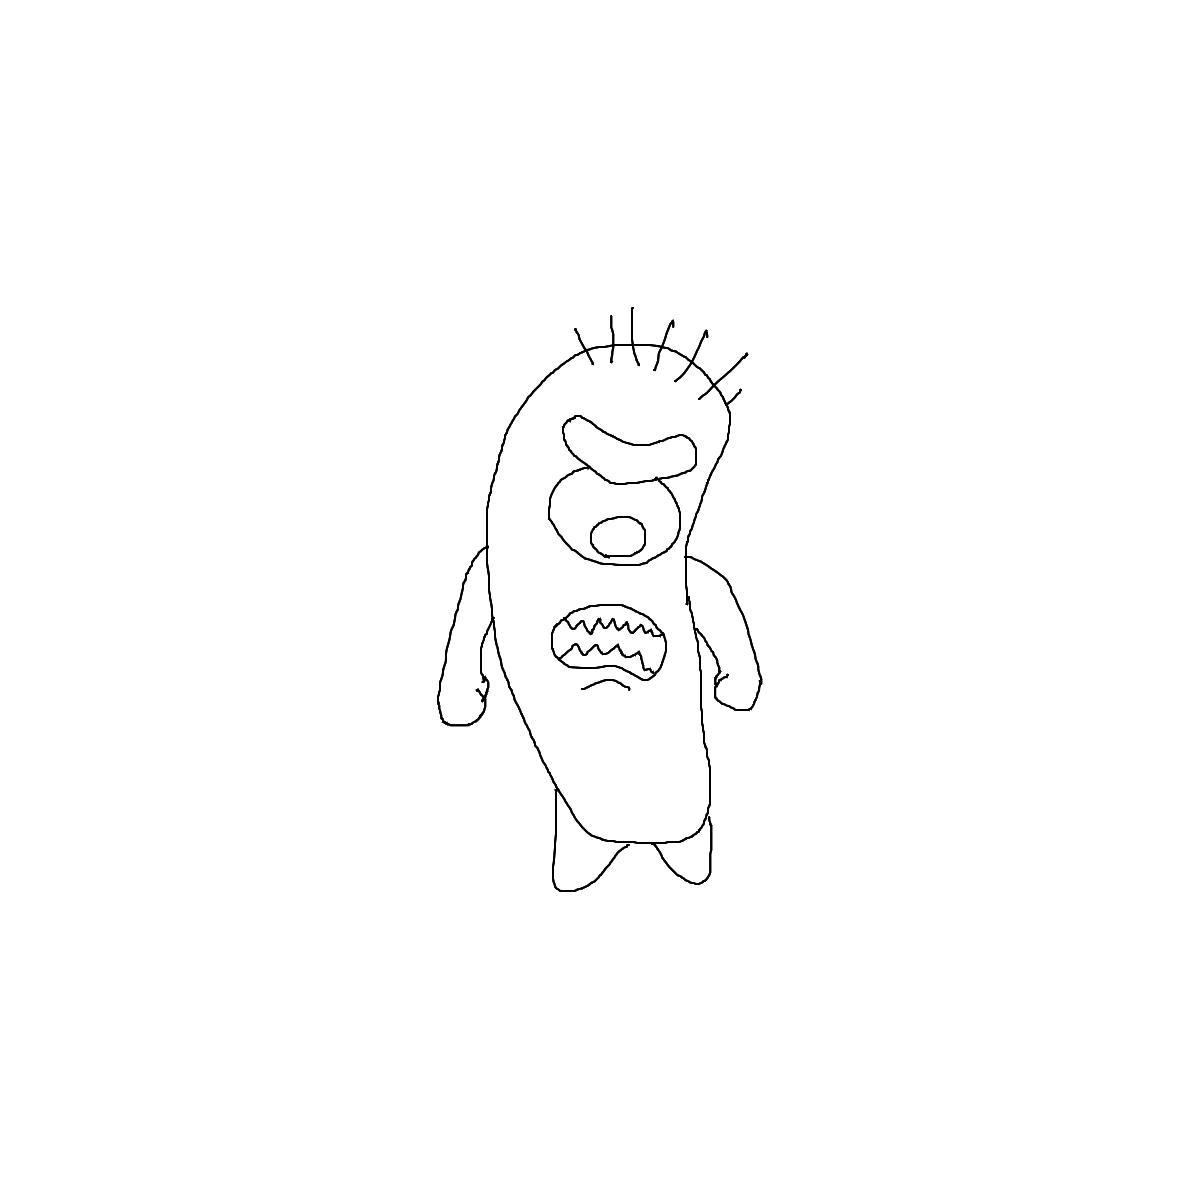 BAAAM drawing#2090 lat:43.0586547851562500lng: -9.2925682067871100